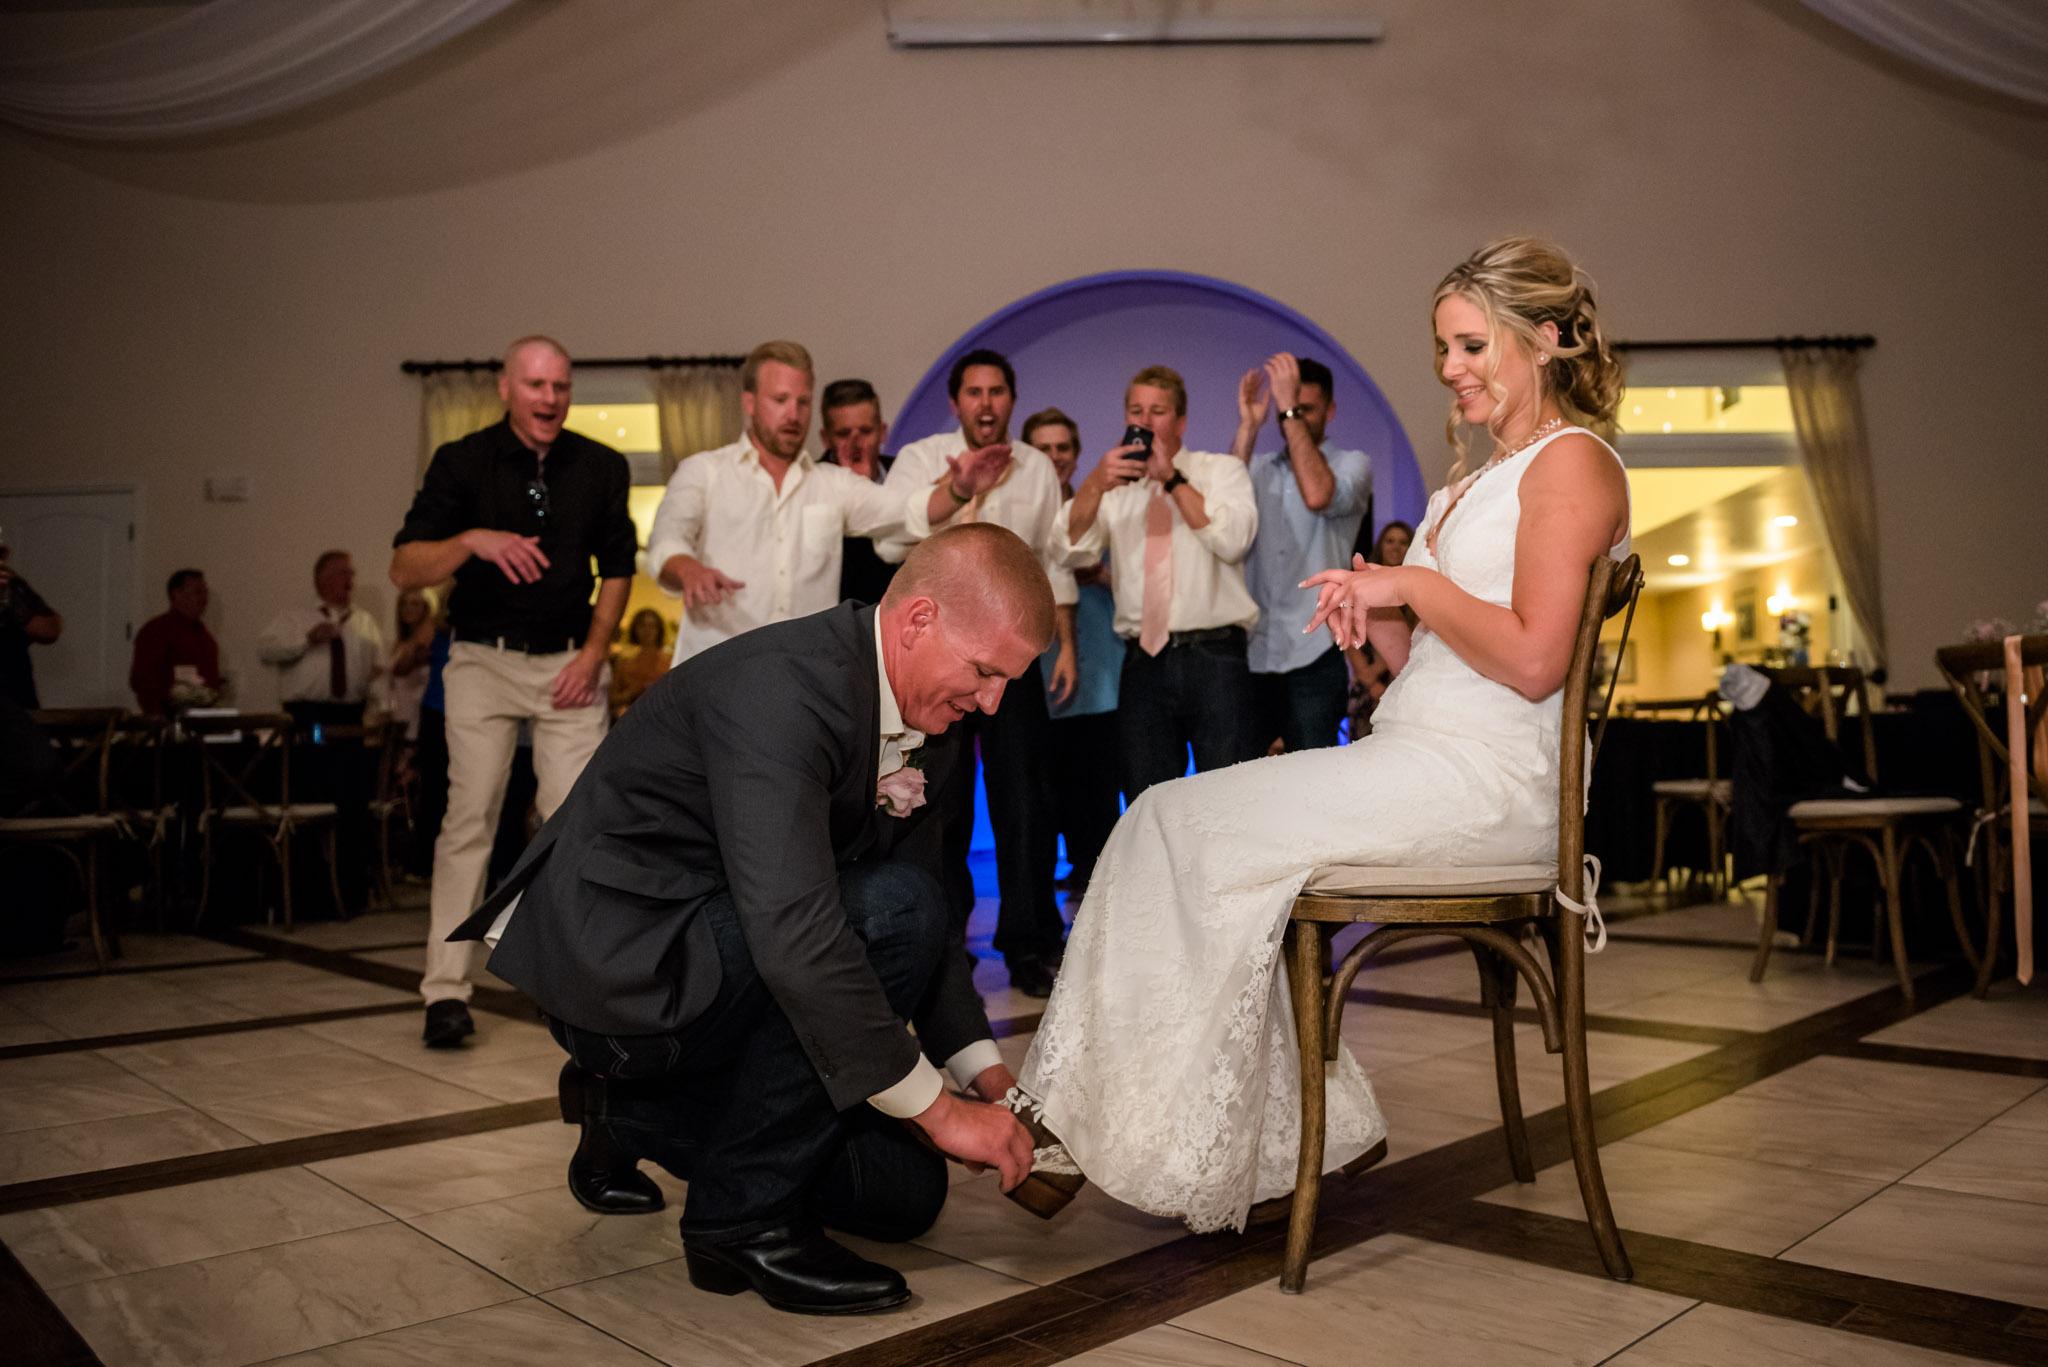 Avensole-Winery-Temecula-Wedding-Josh-and-Olivia-4436.JPG